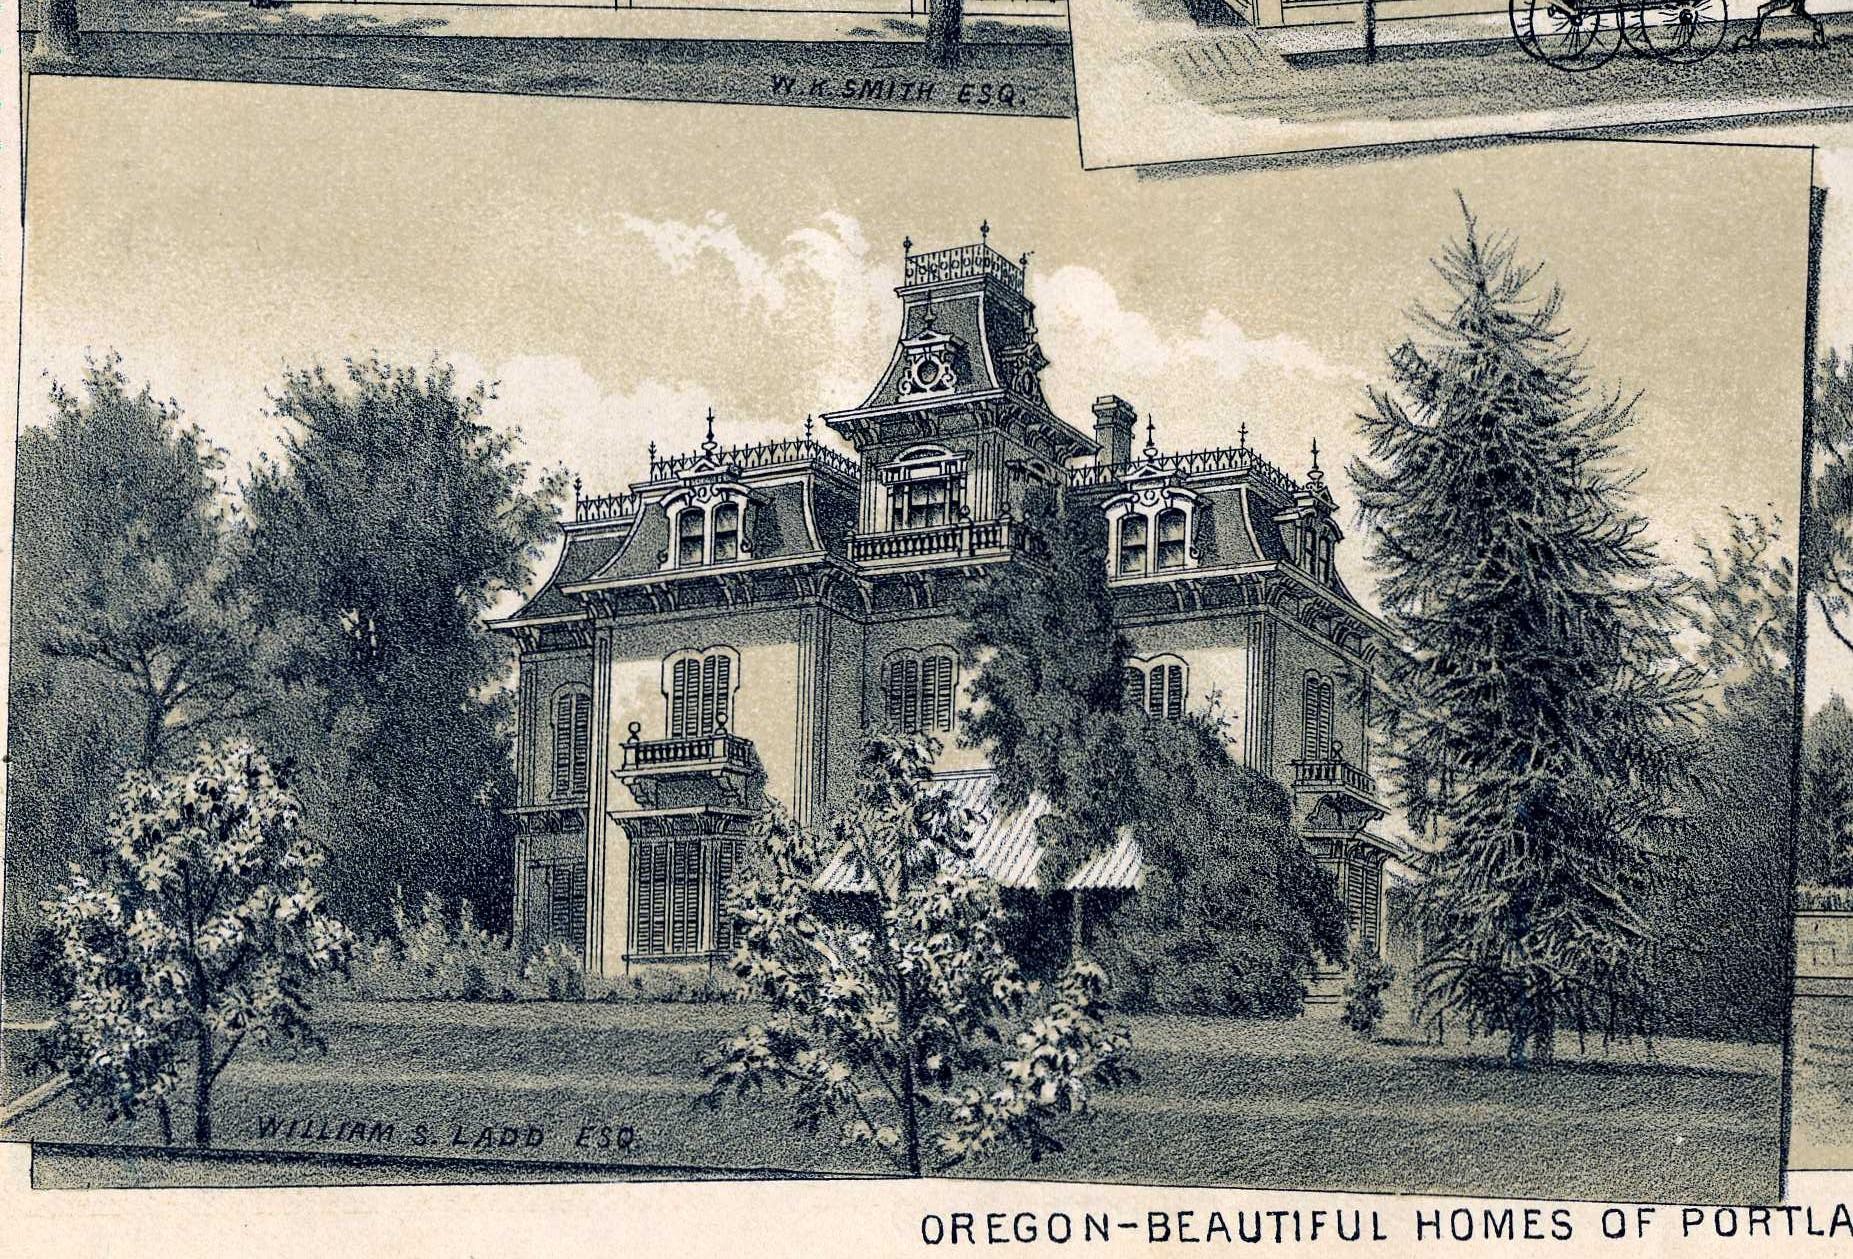 Ladd Mansion